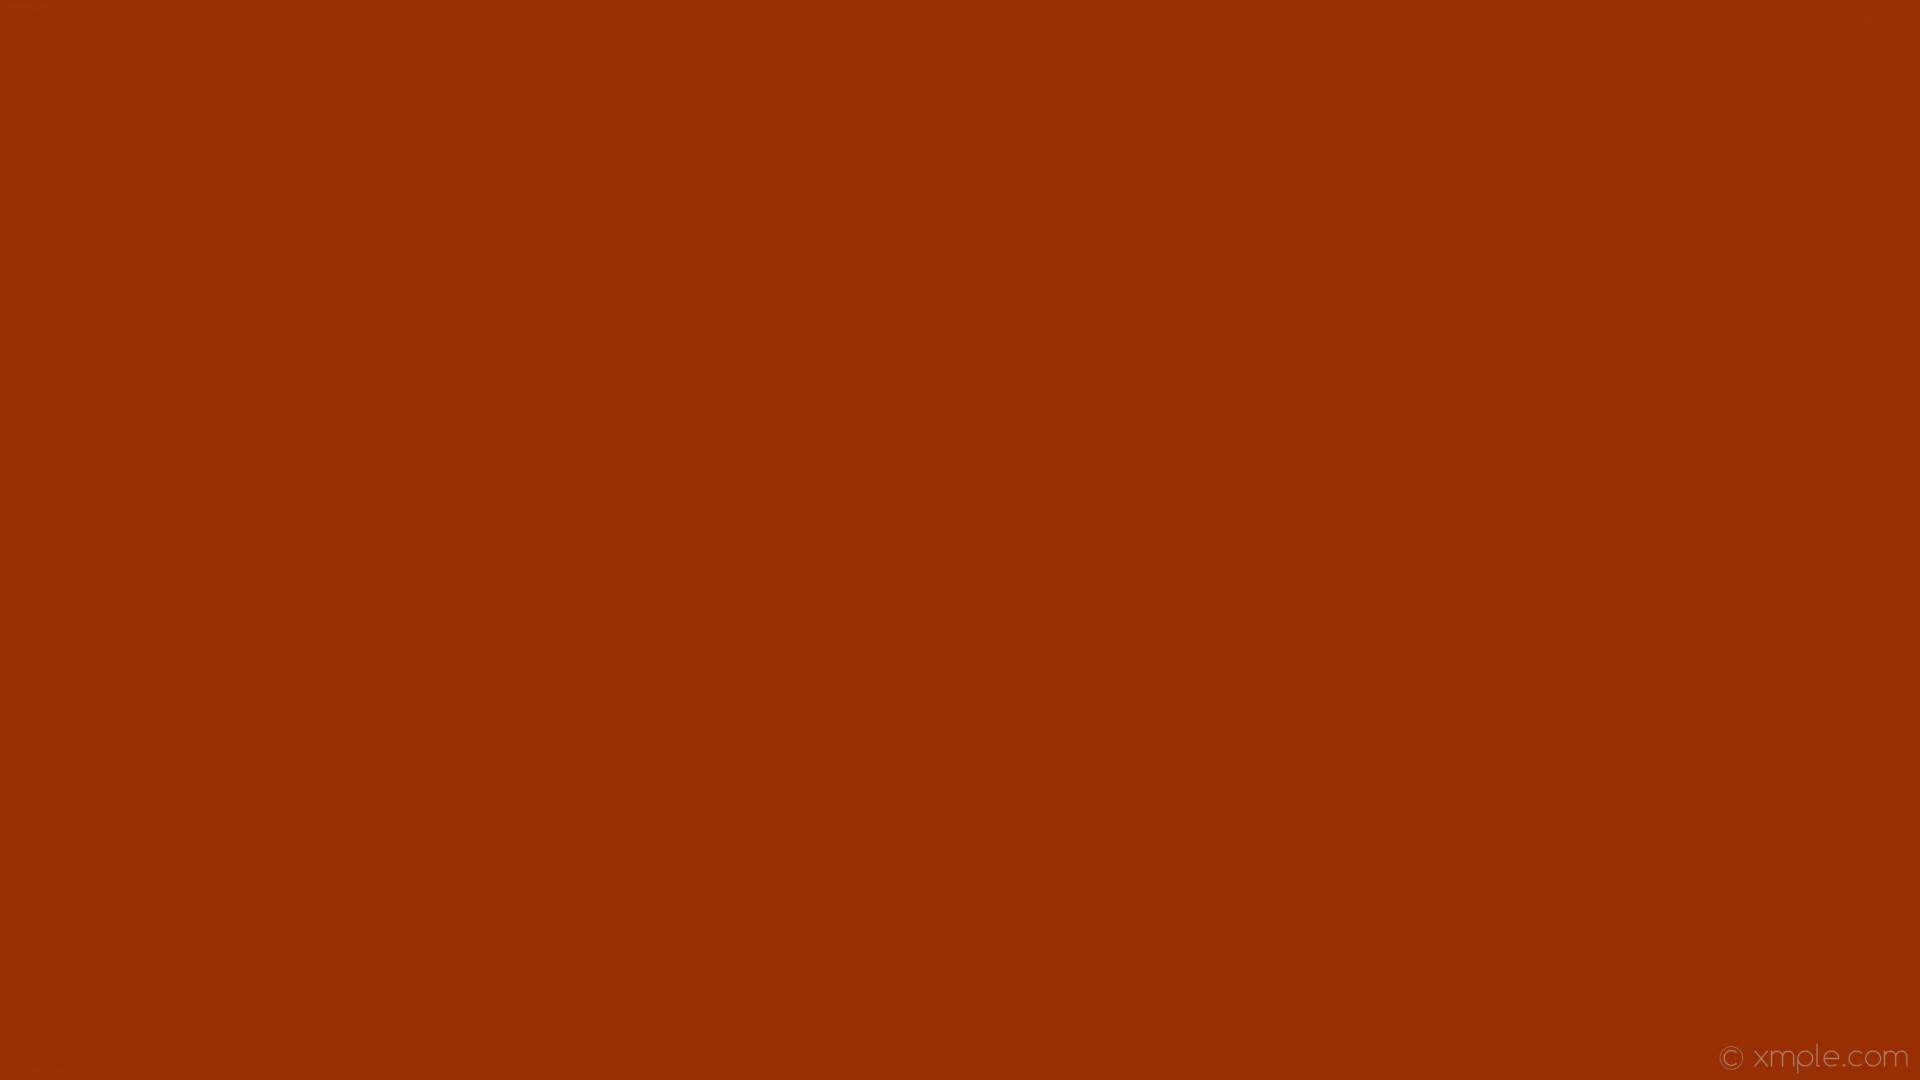 wallpaper orange plain one colour solid color single #992e01